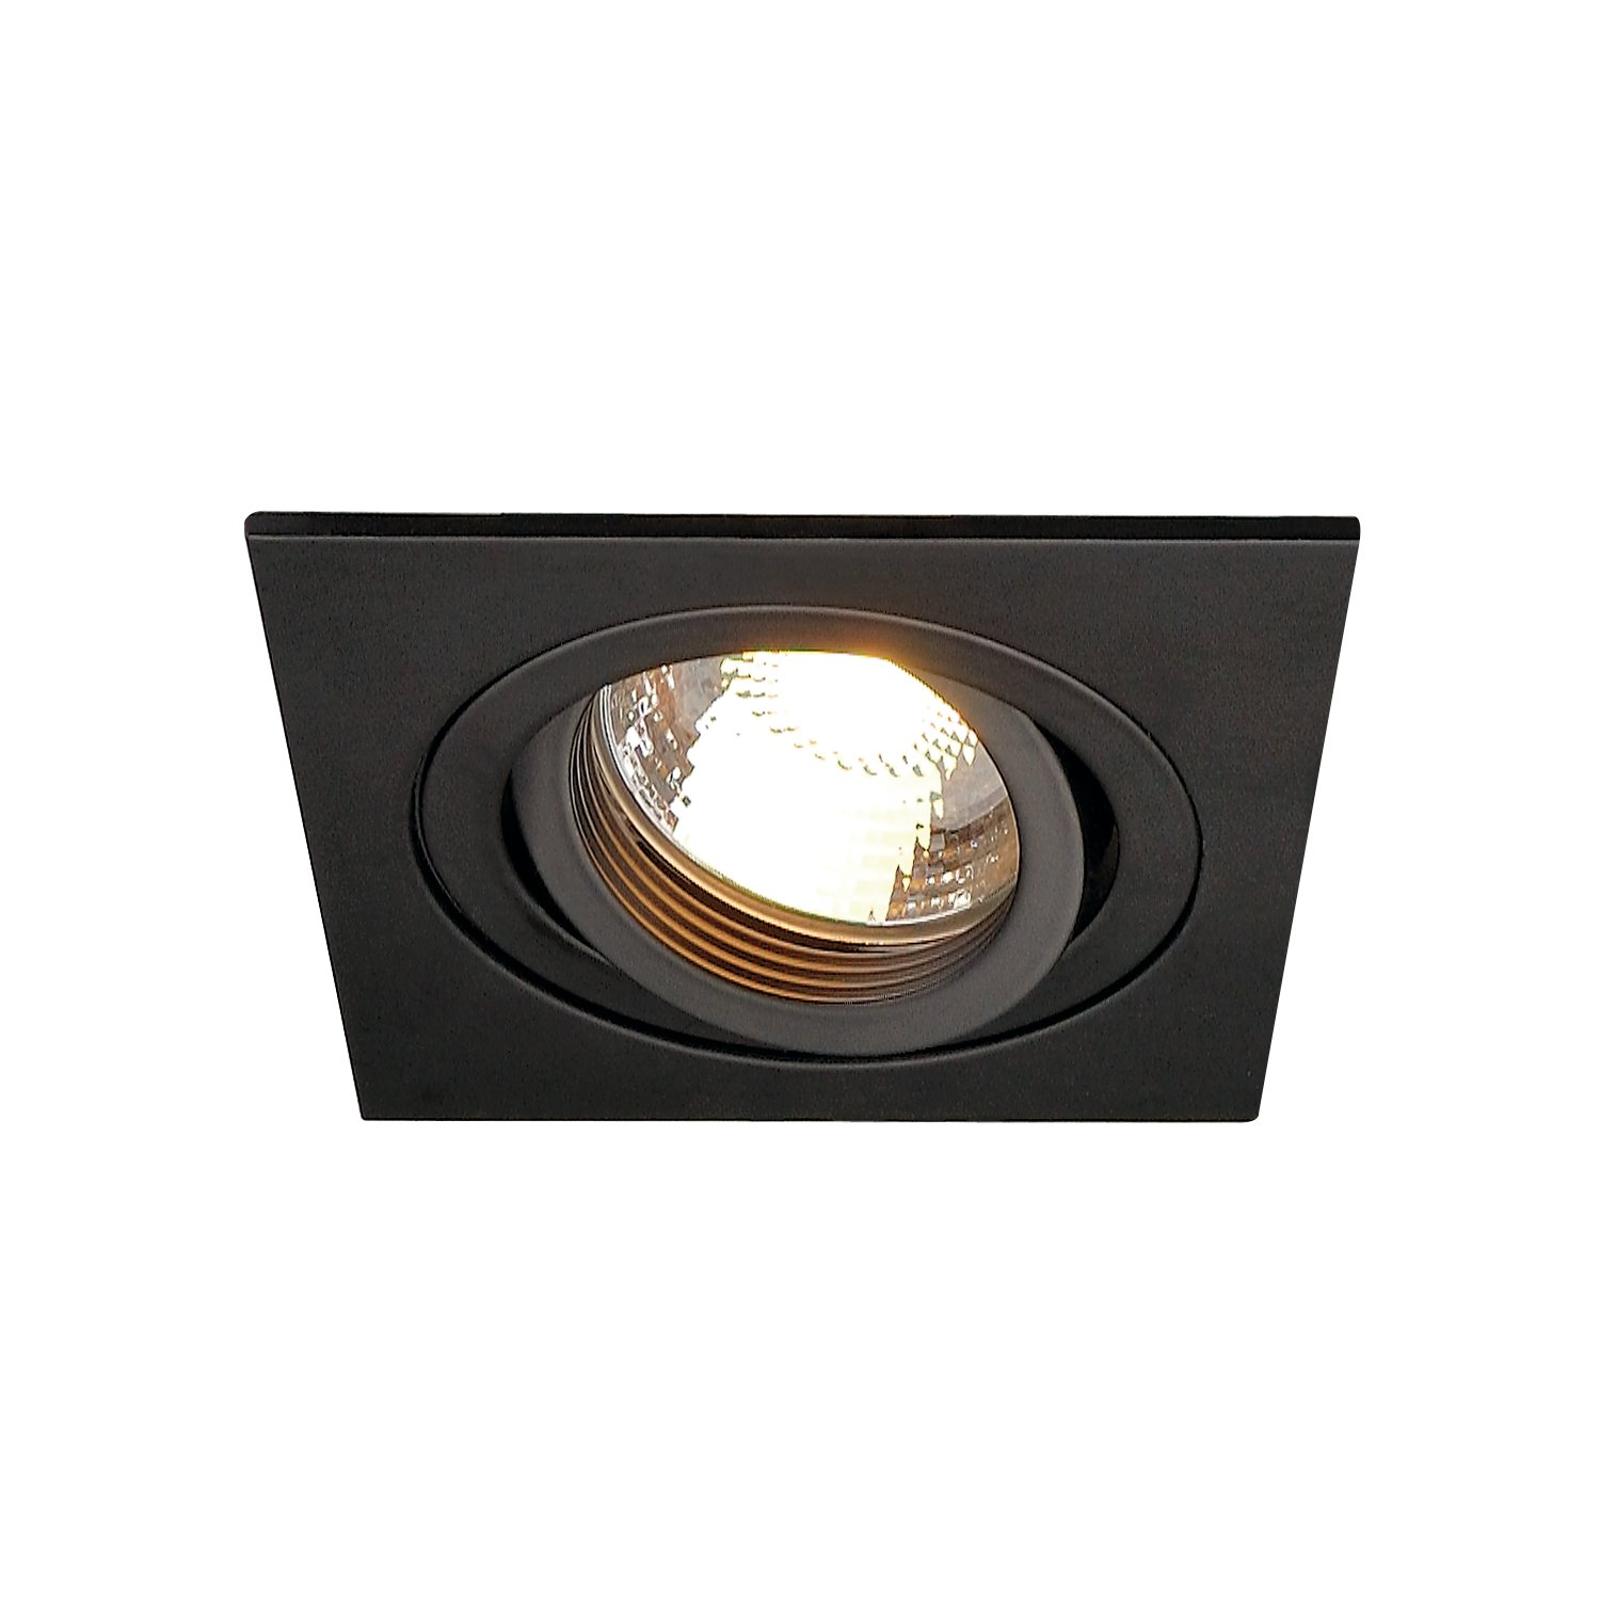 SLV New Tria 1 recessed spotlight GU10, black_5511305_1